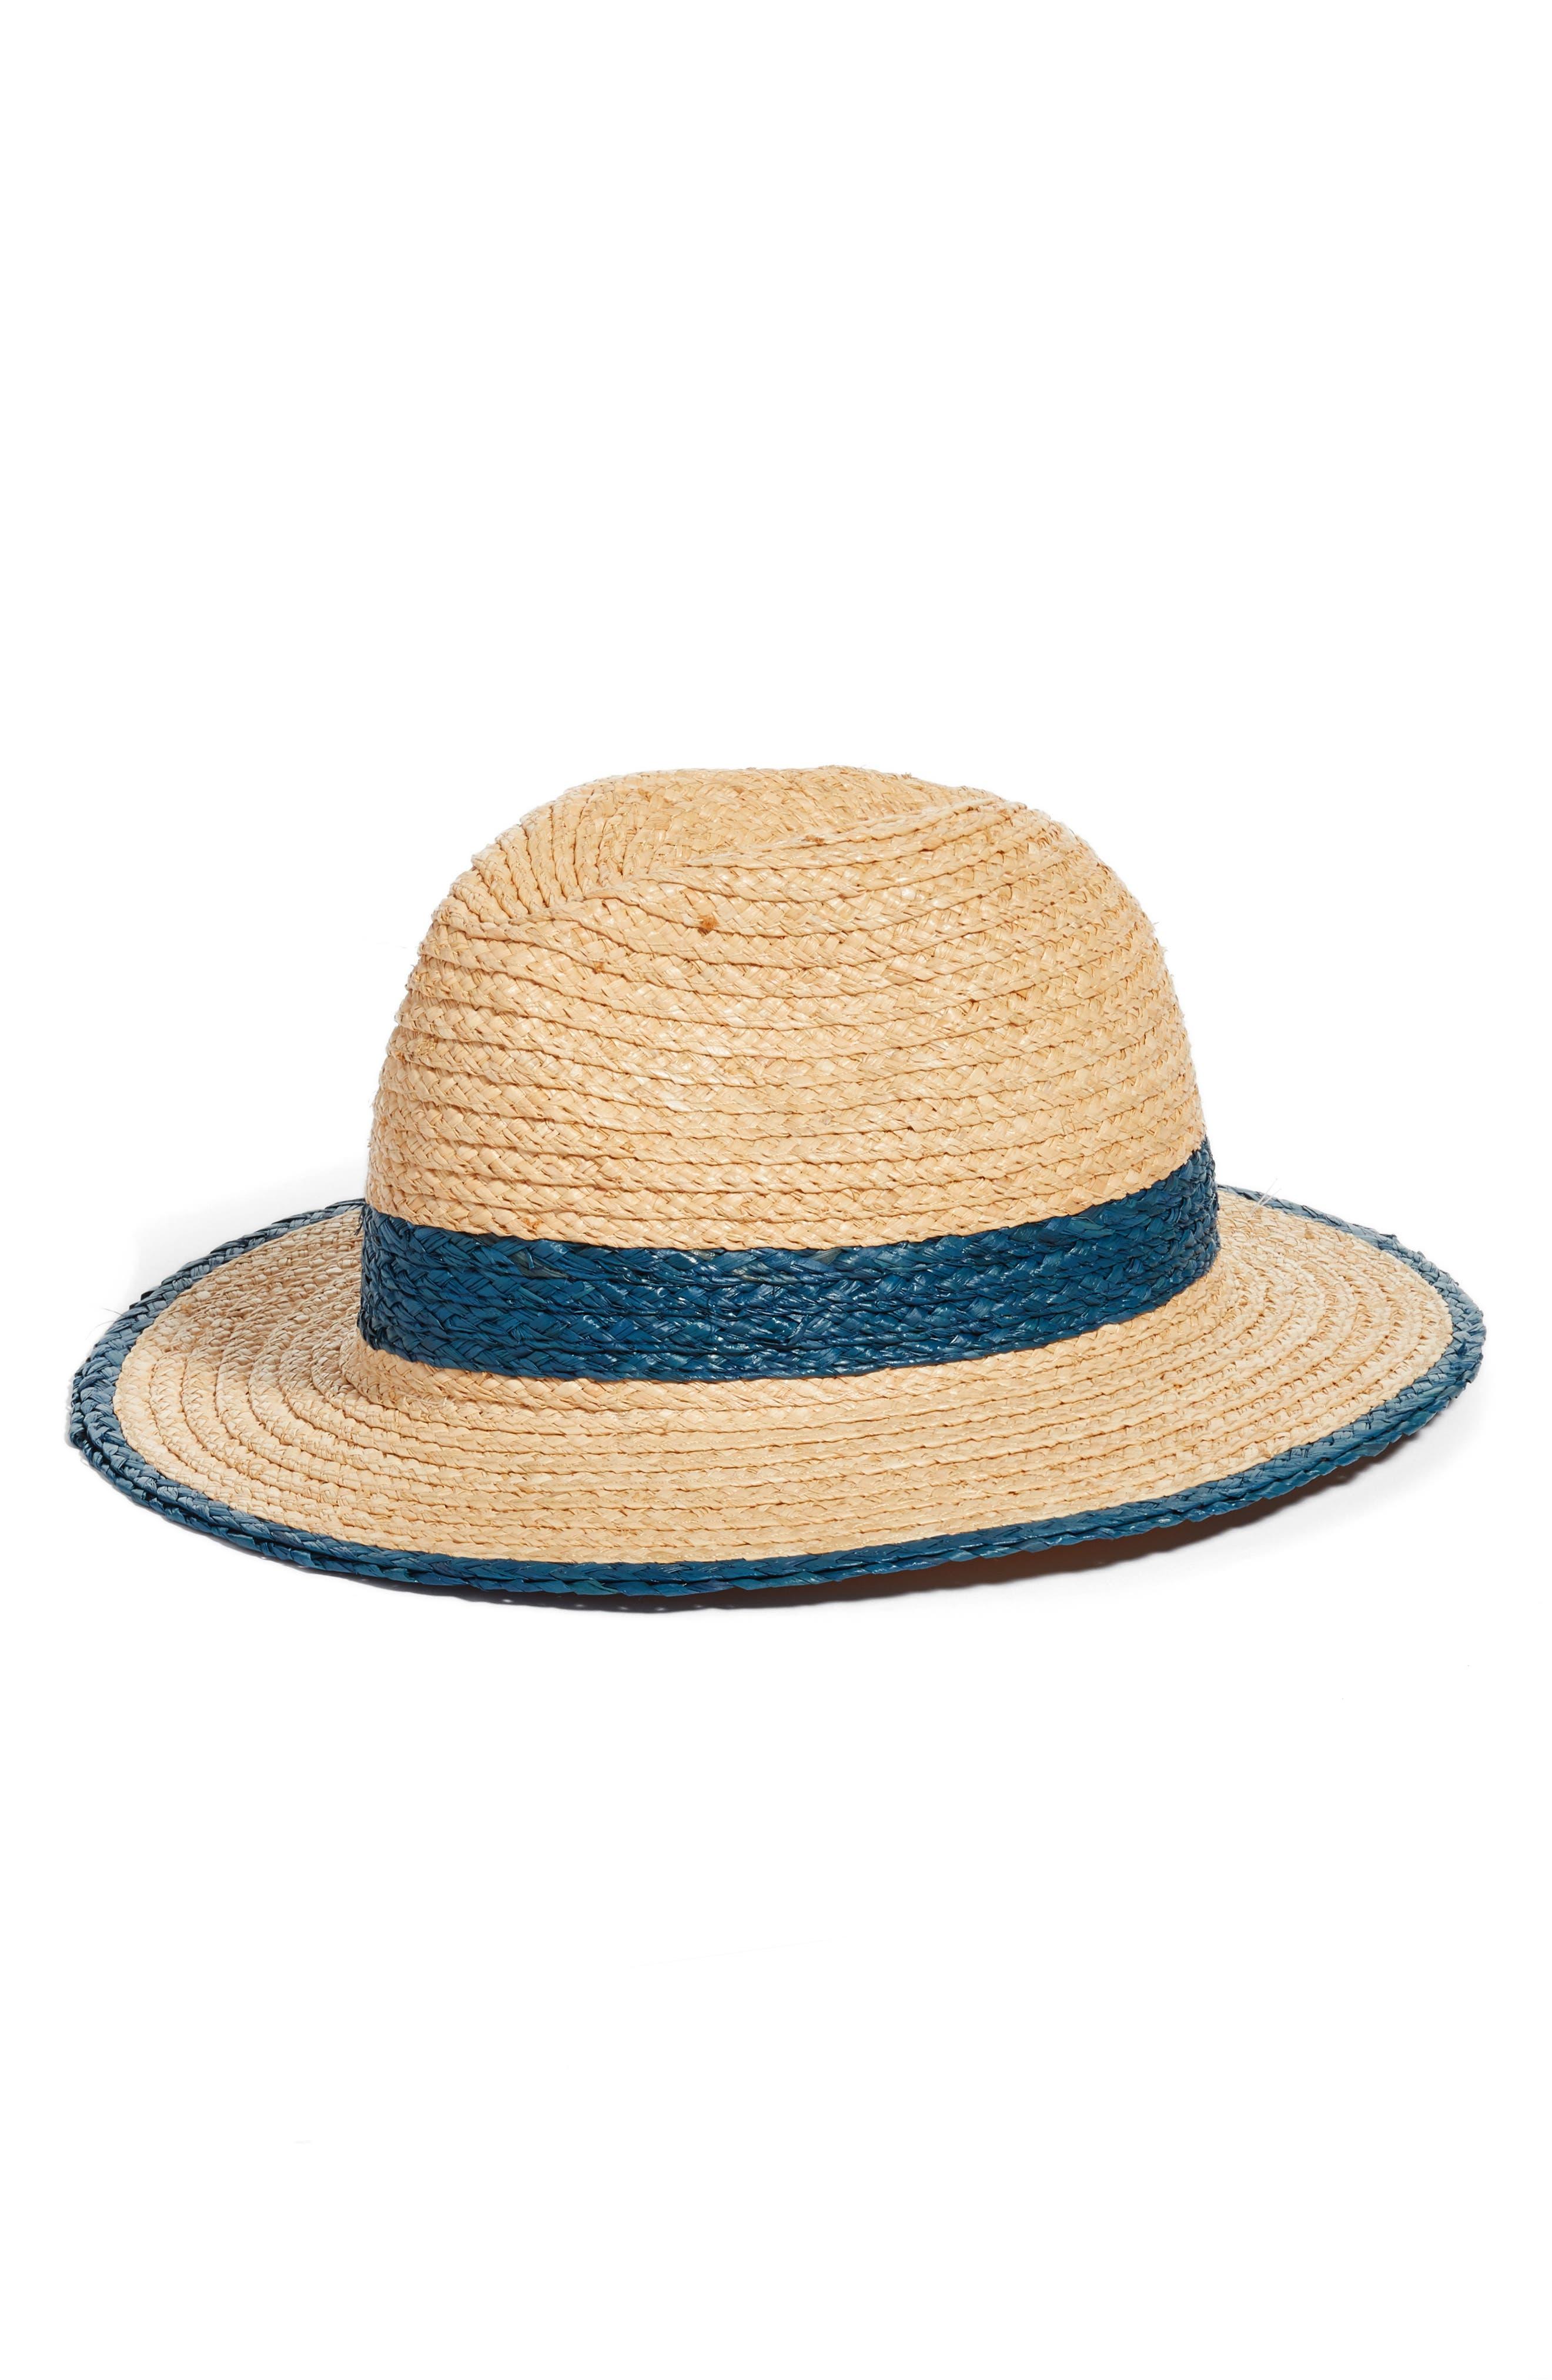 Contrast Trim Straw Panama Hat,                             Main thumbnail 1, color,                             Natural Combo